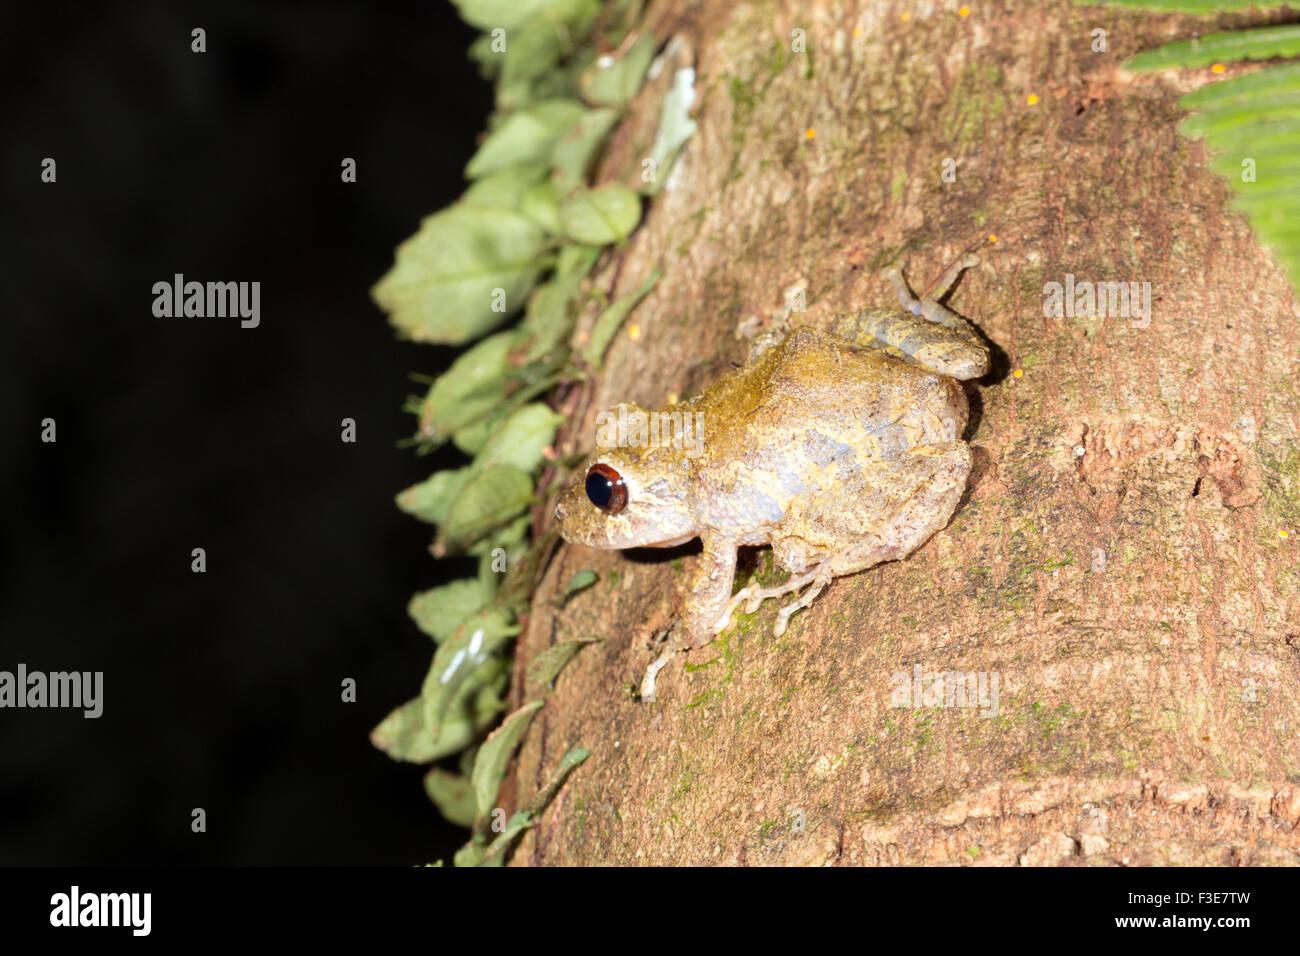 Diadem Rain Frog (Pristimantis diadematus) on a rainforest tree trunk in Ecuador - Stock Image